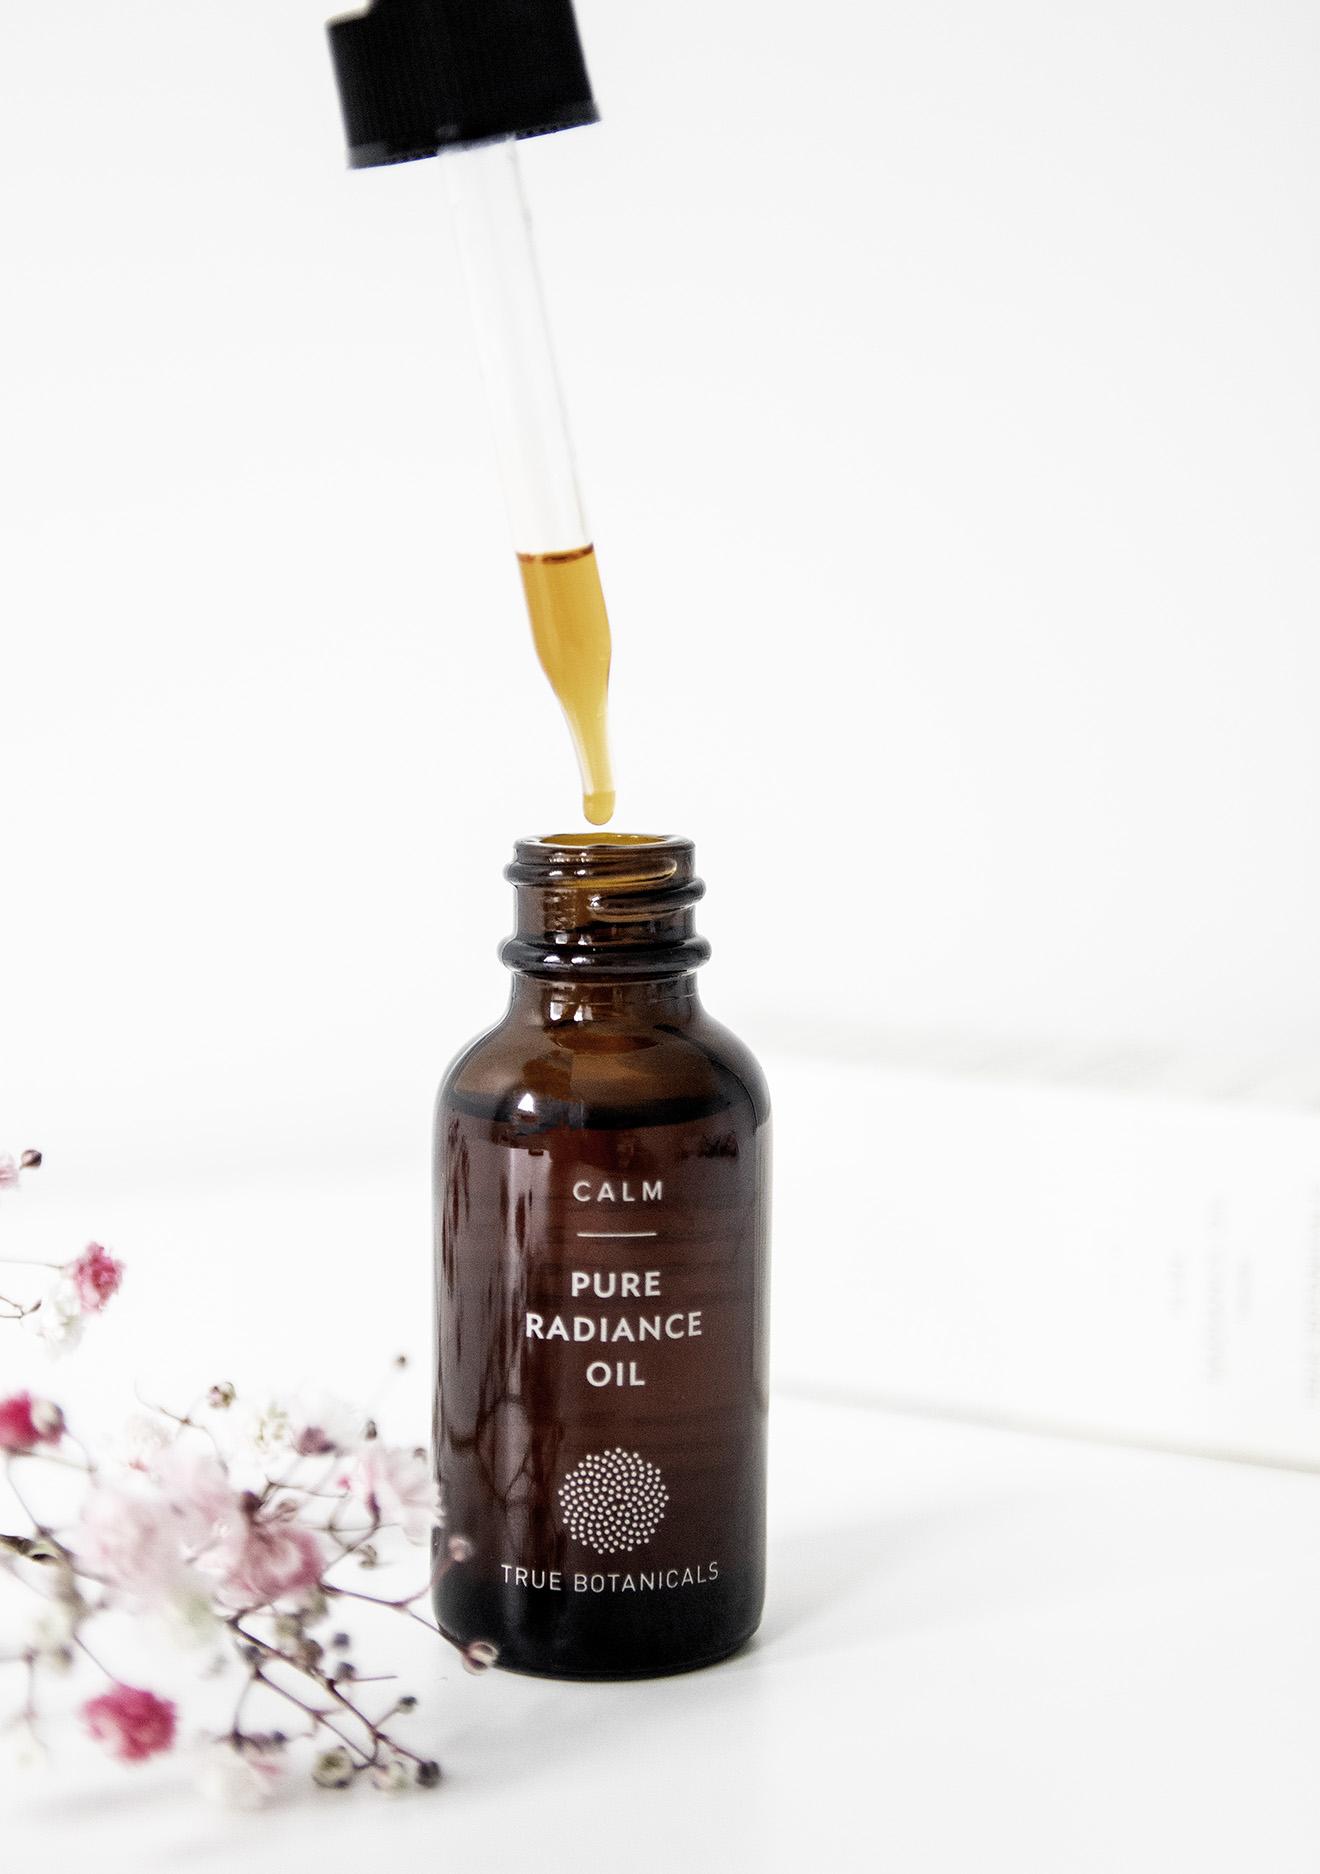 True Botanicals Organic Calm Pure Radiance Oil